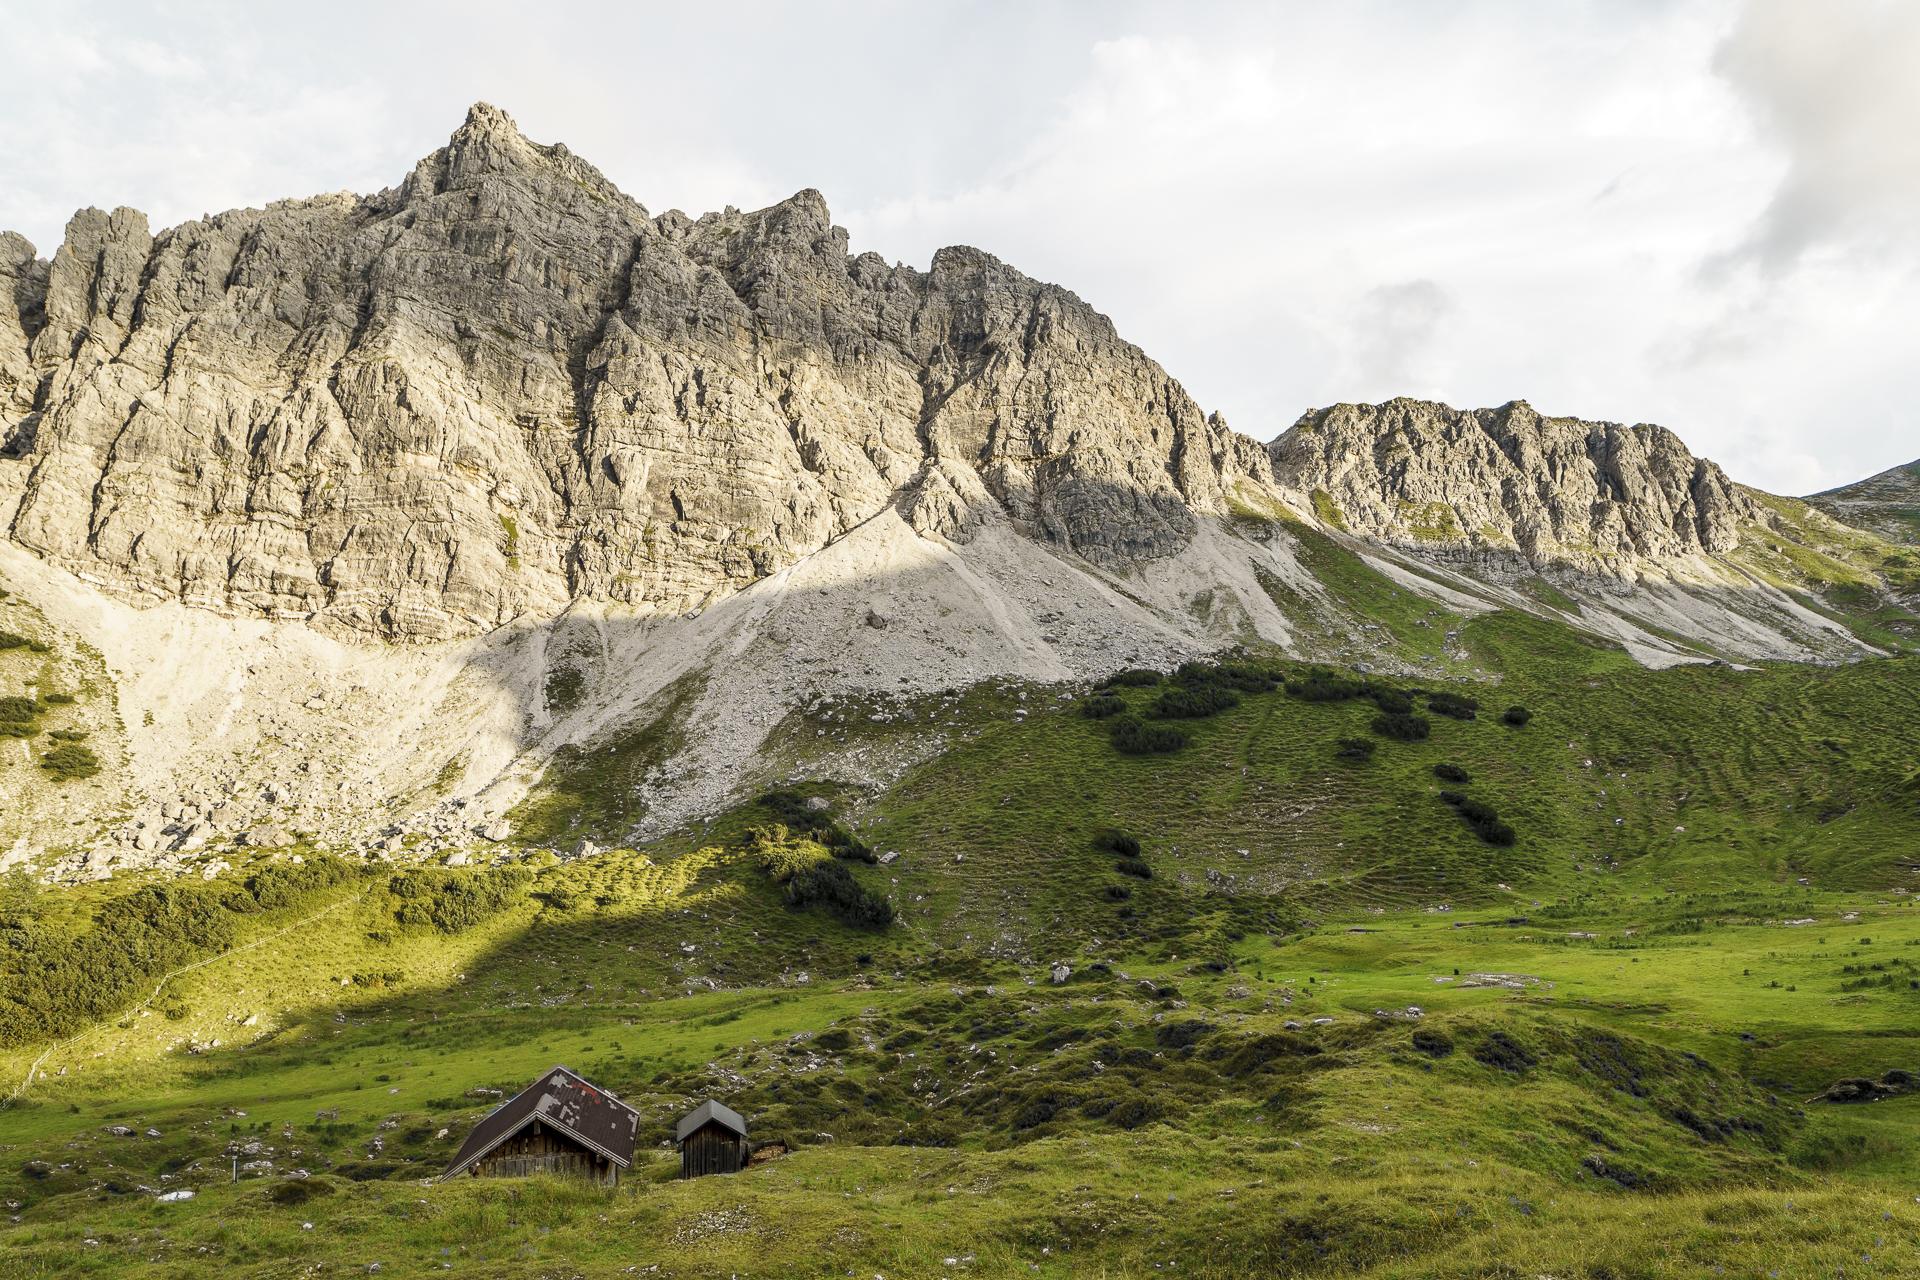 Lachenspitze Allgäuer Alpen